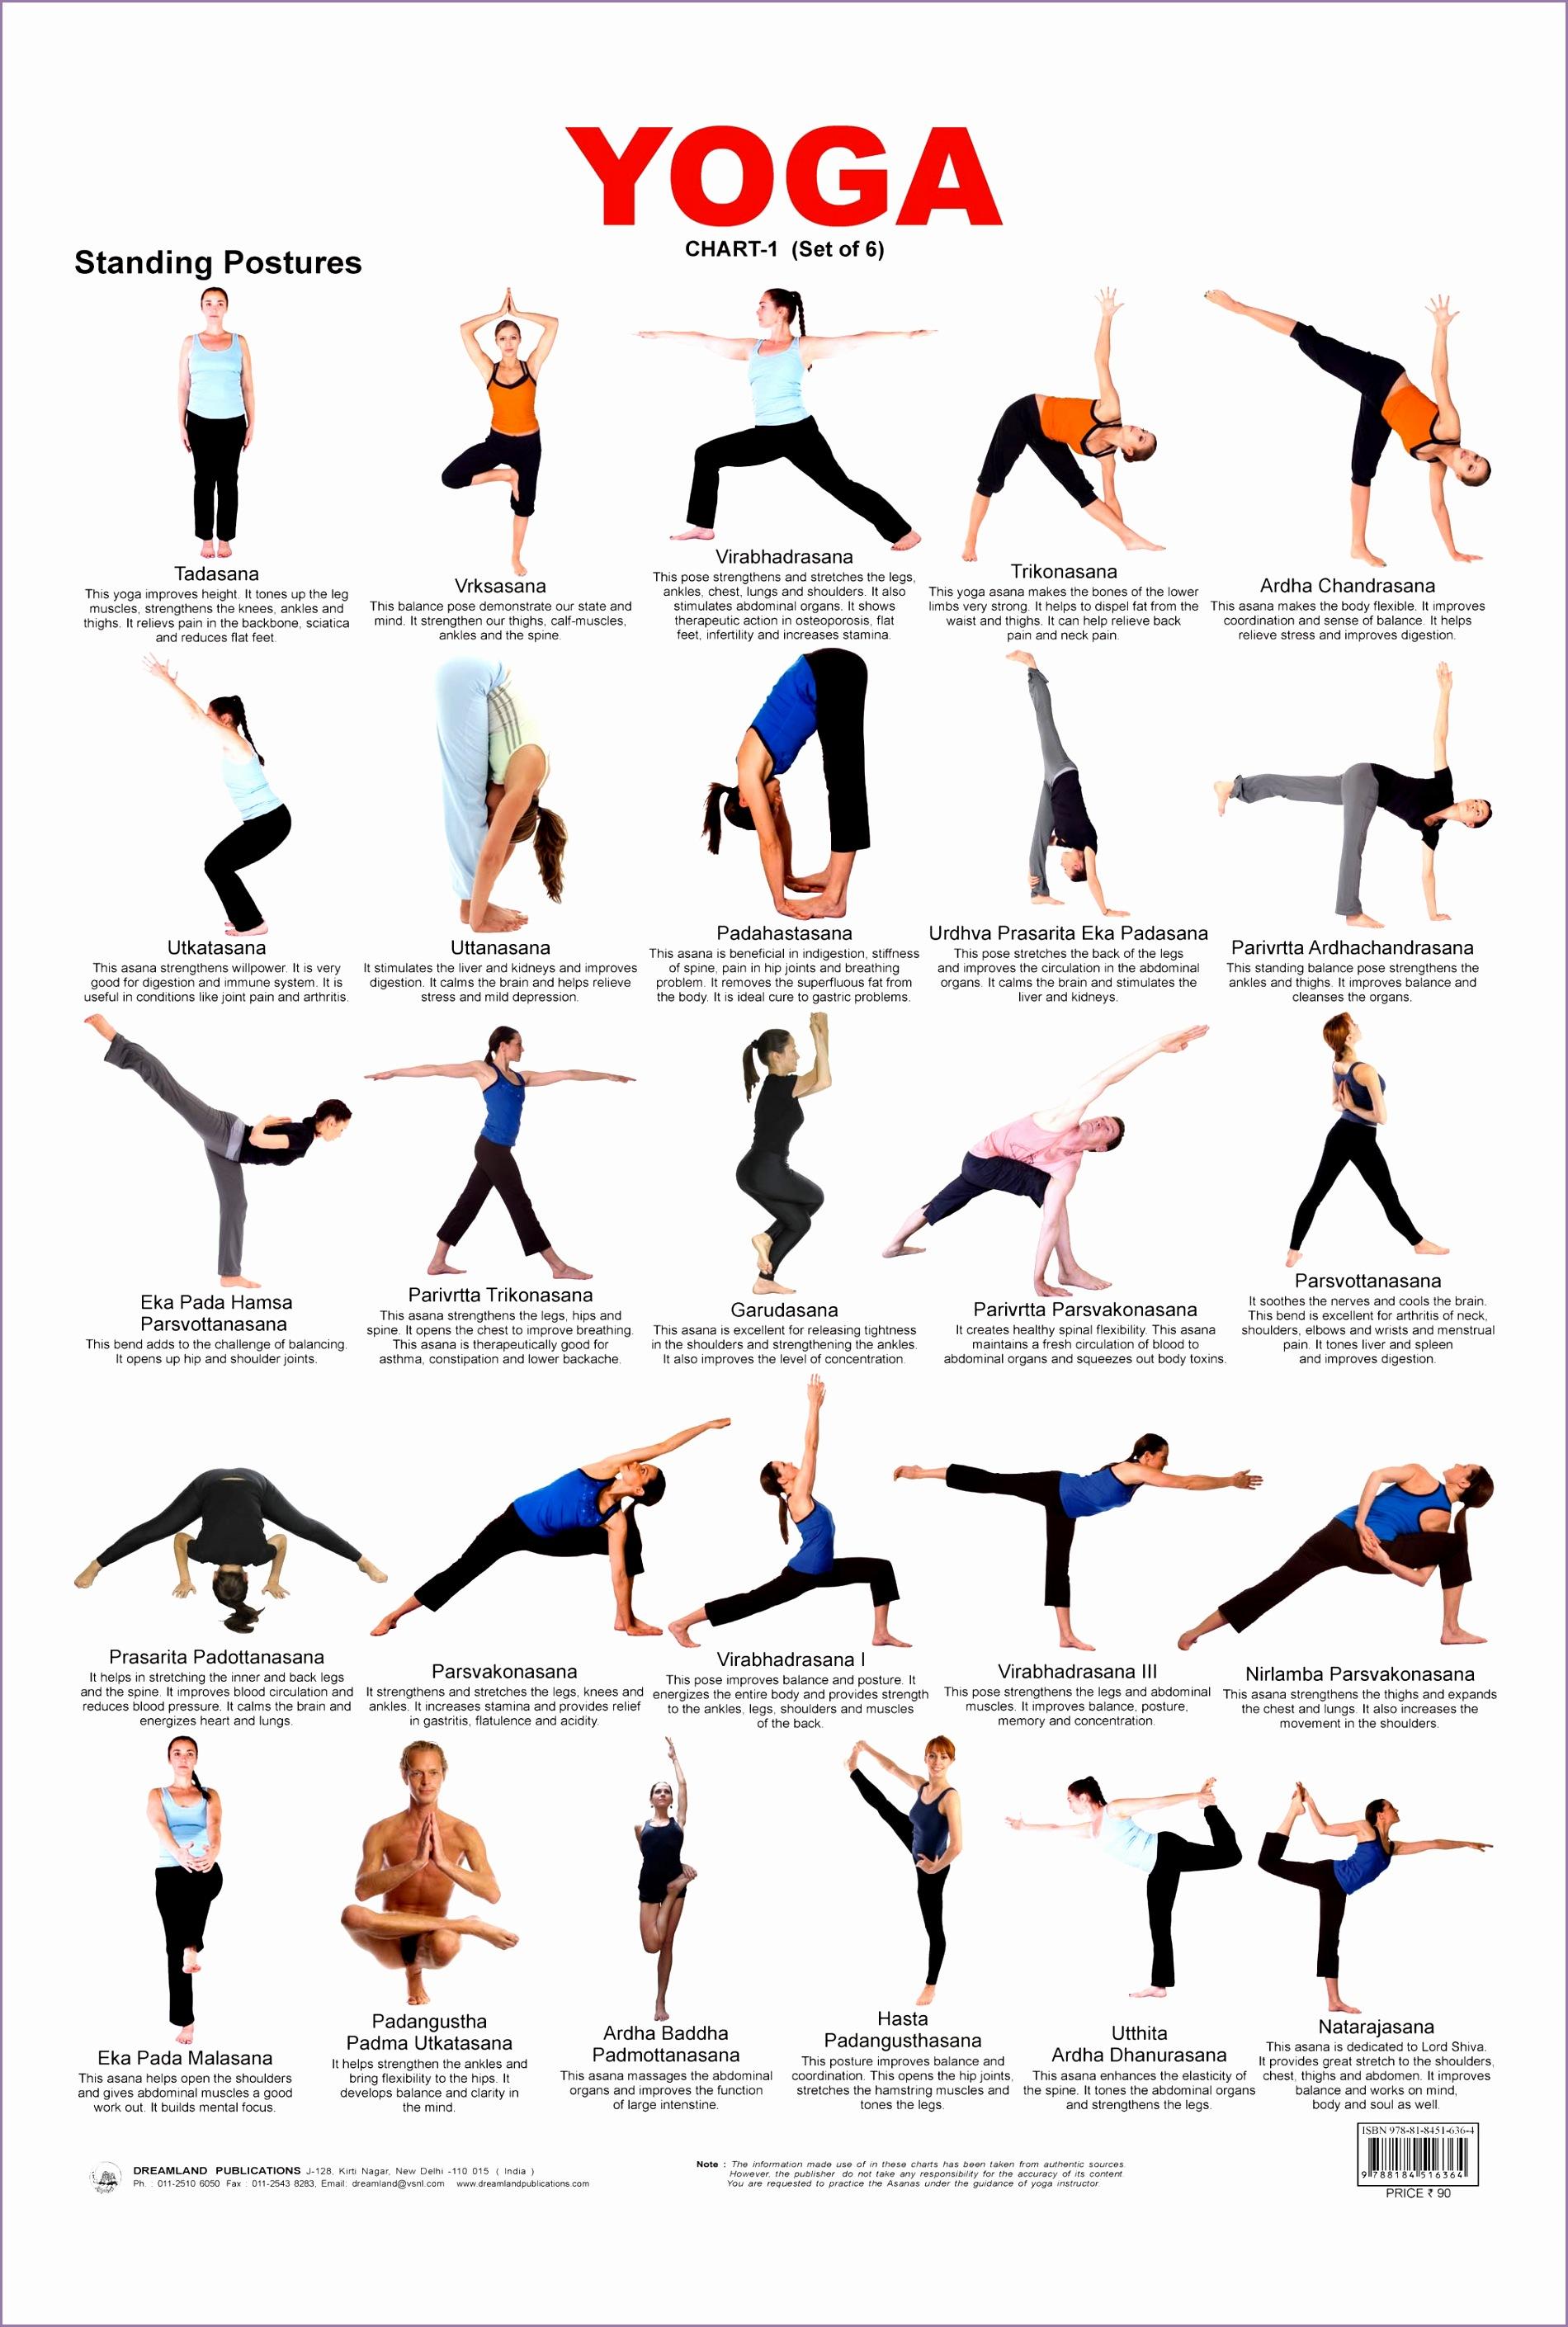 Trikonasana Triangle Pose Benefits